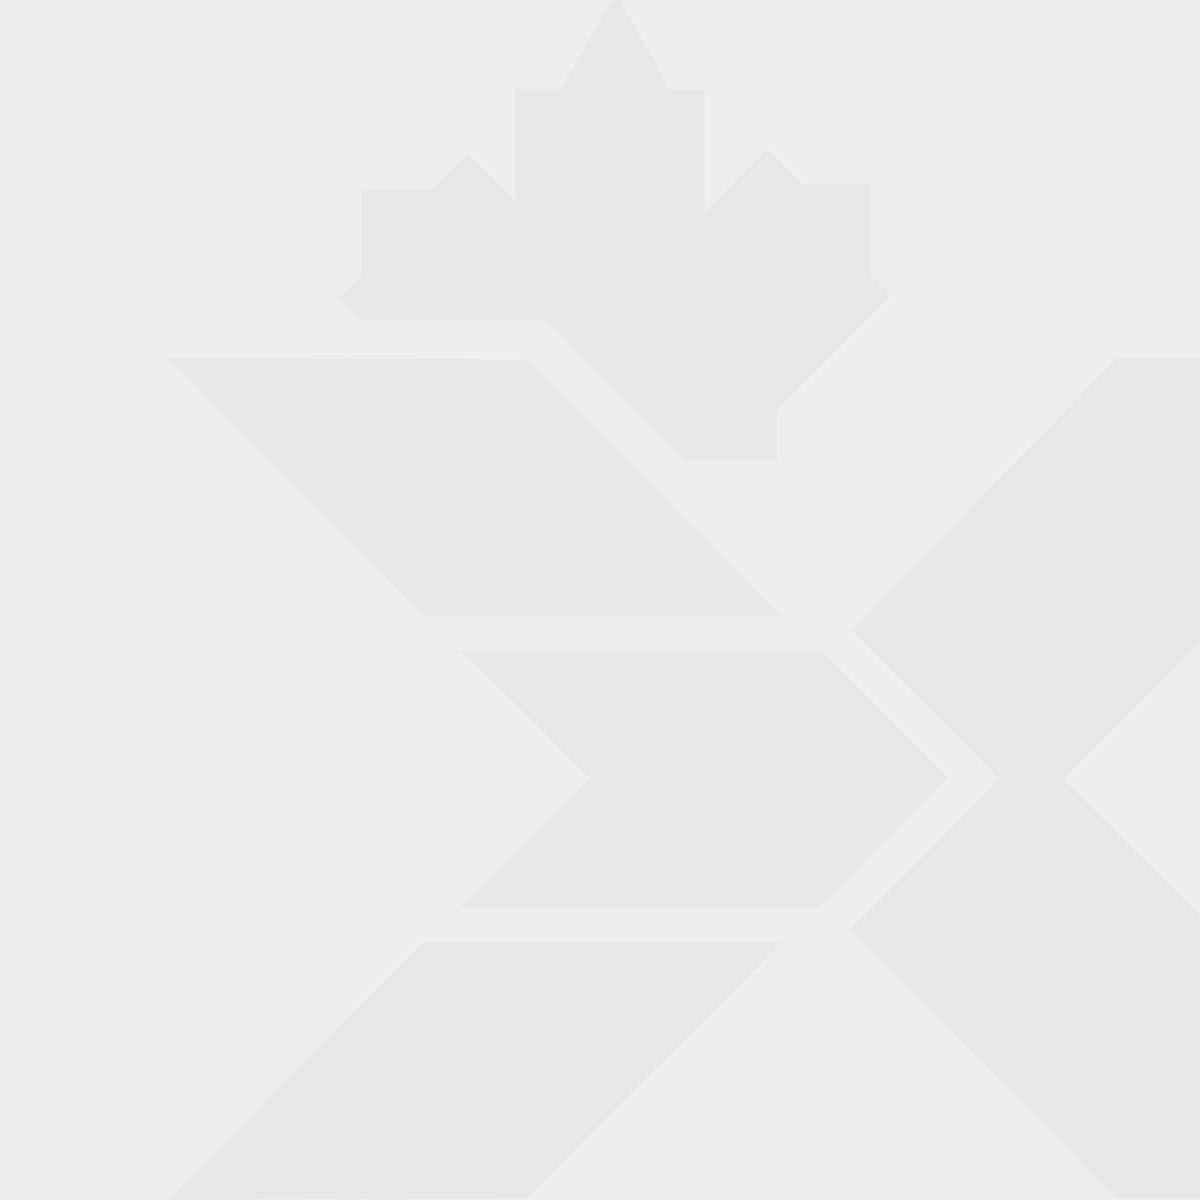 HMCS Vancouver Vacuum Tumbler